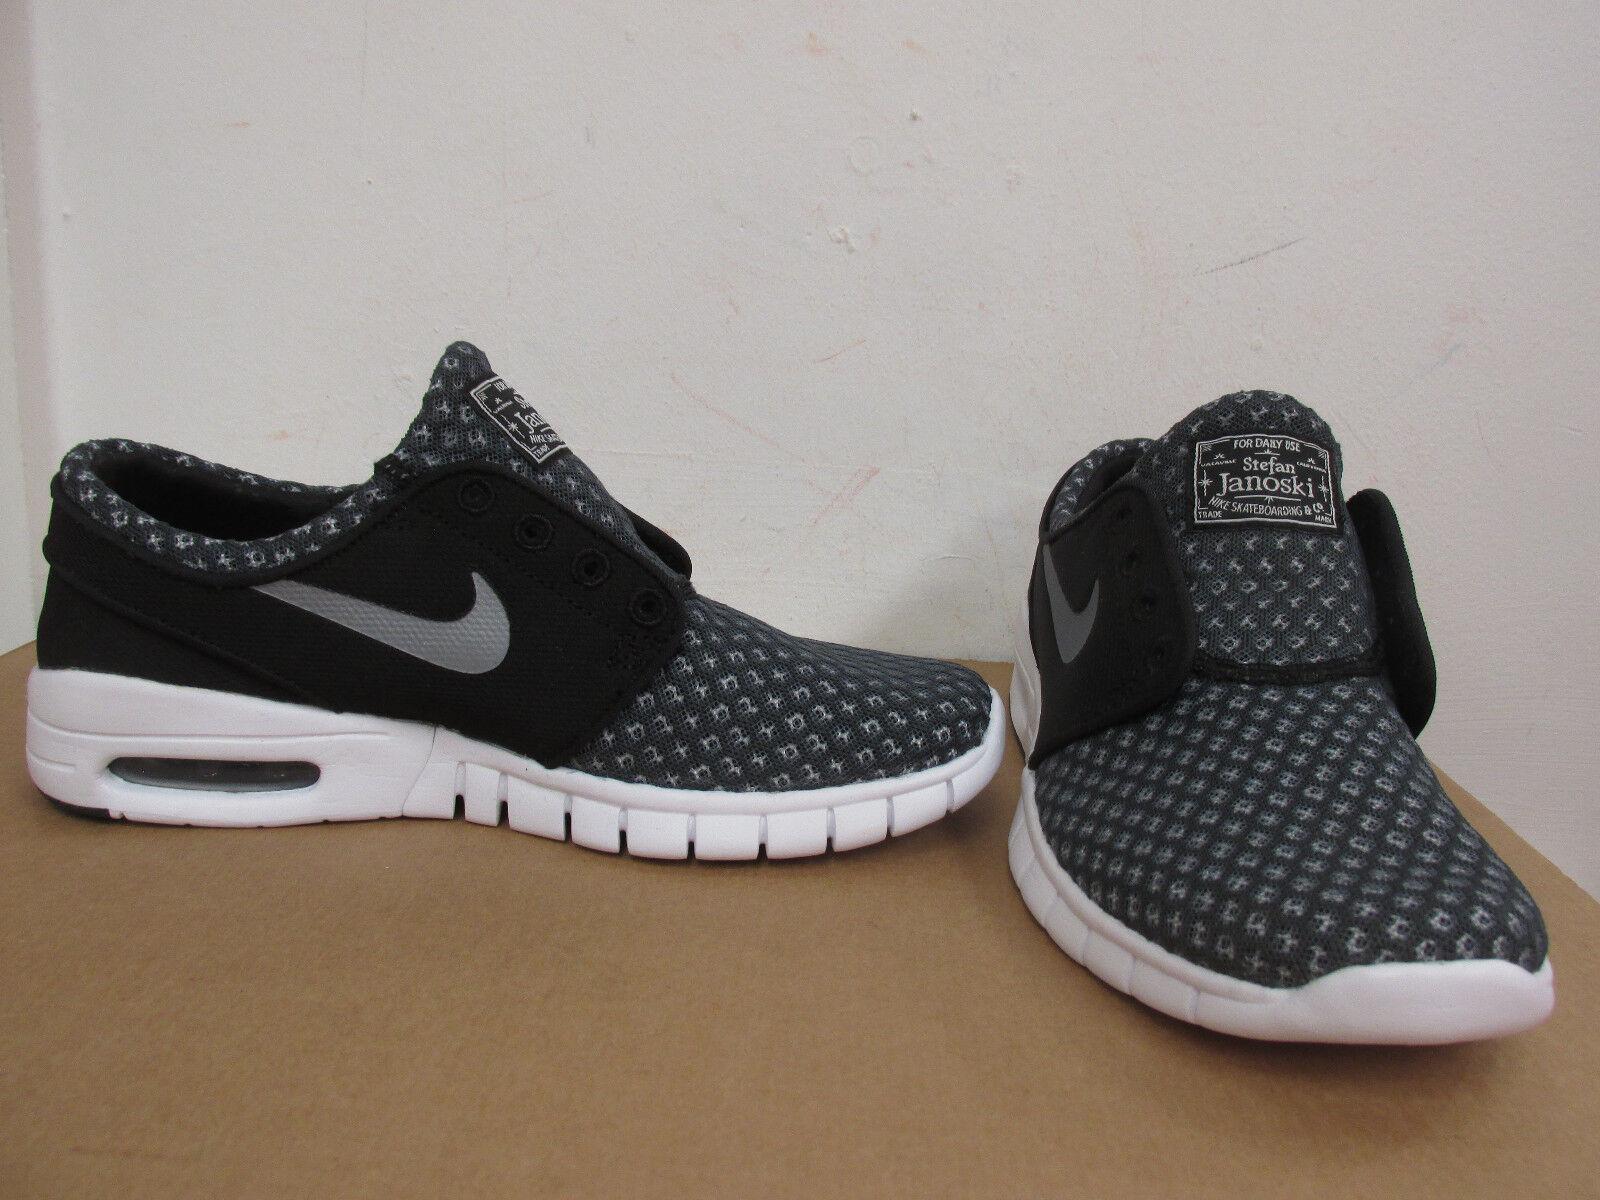 Nike SB stefan janoki max mens trainers 631303 004 sneakers shoes SAMPLE